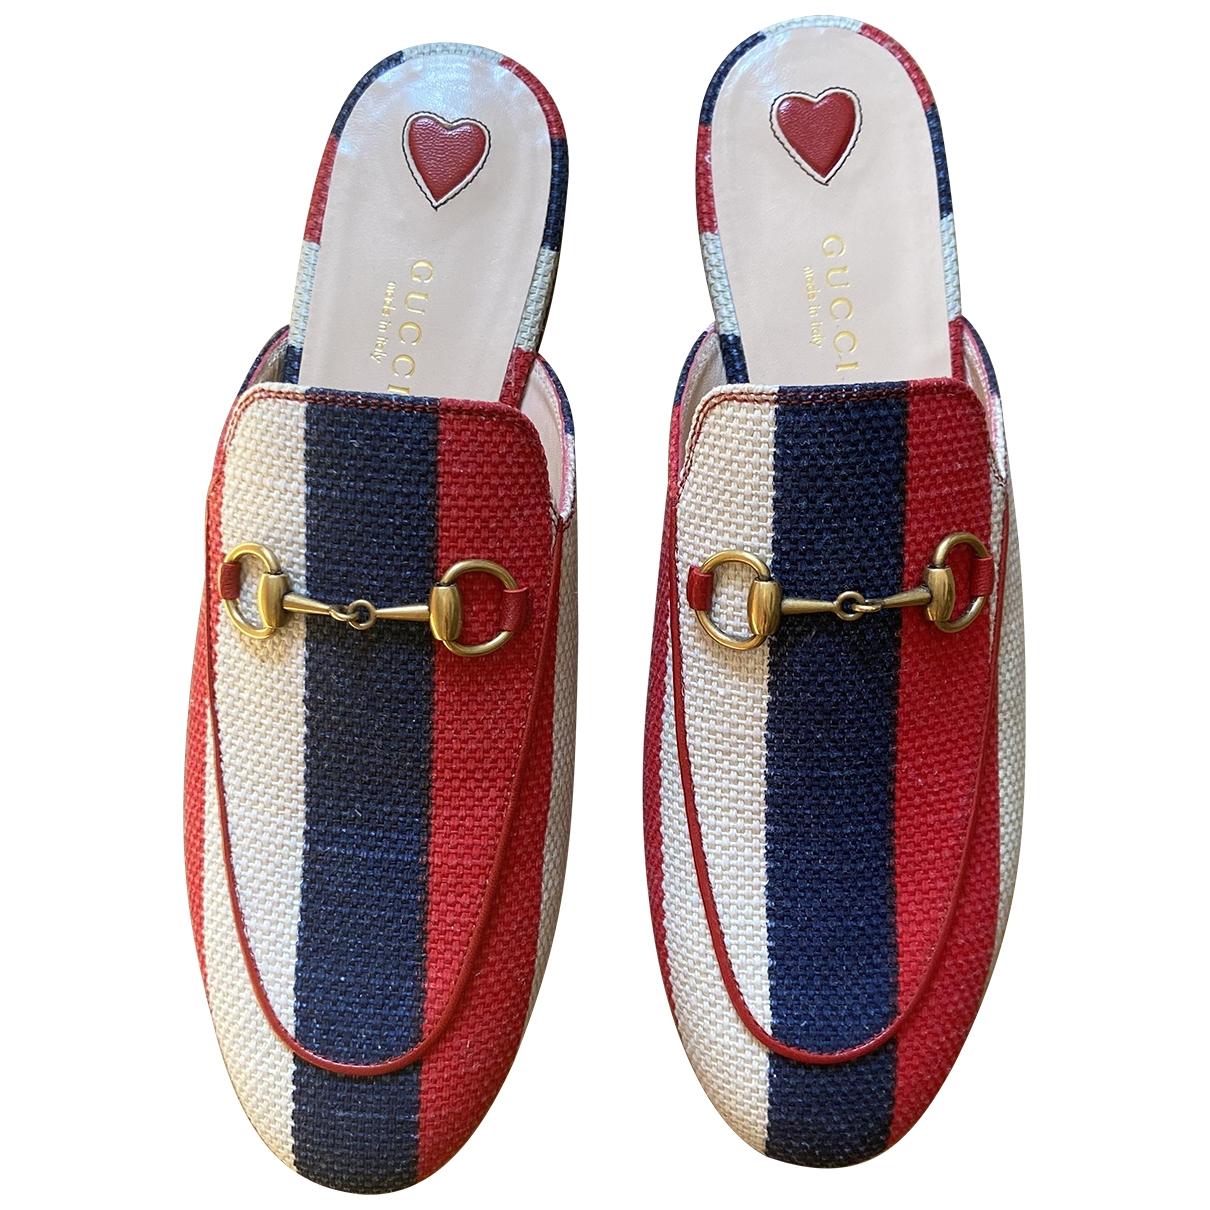 Gucci Princetown Multicolour Cloth Flats for Women 37.5 EU